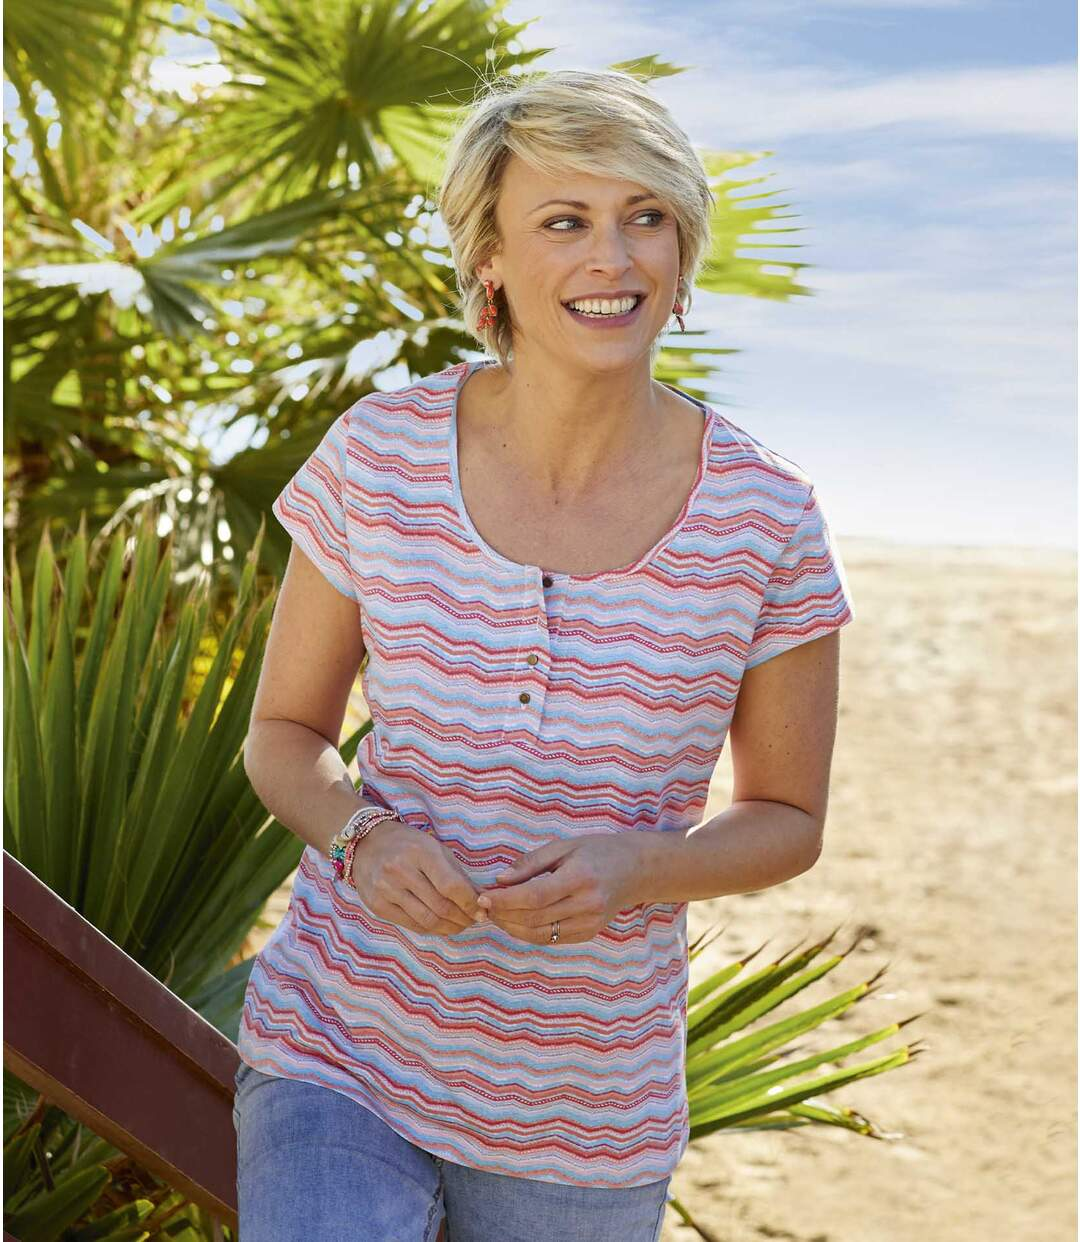 Women's Zigzag Print T-Shirt - Multi-coloured